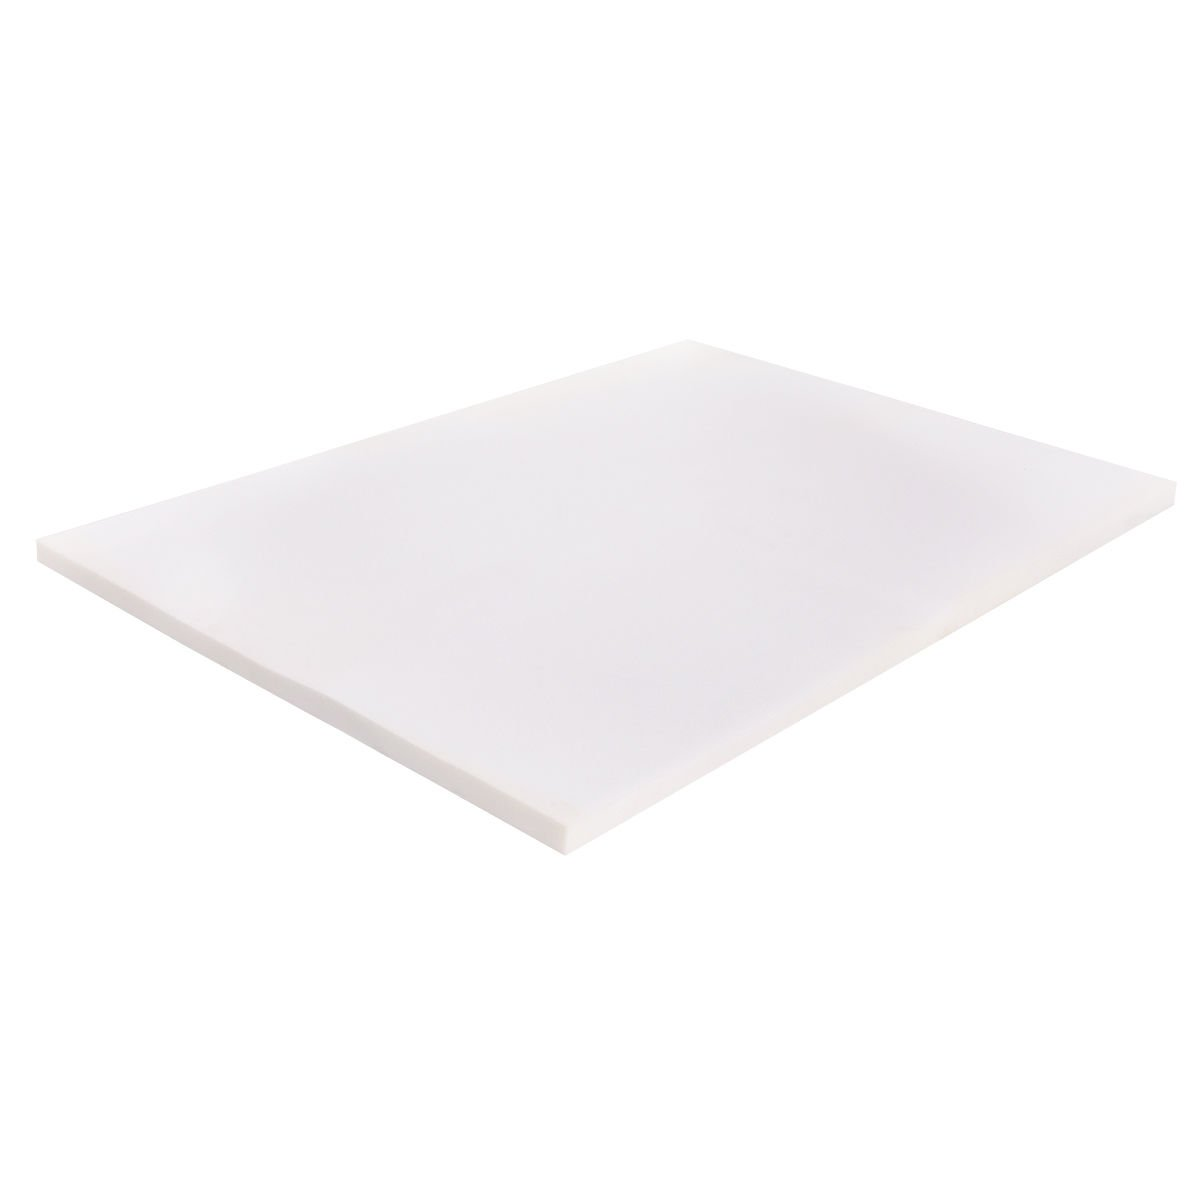 Giantex White 45d Memory Sponge Memory Foam Mattress Pad